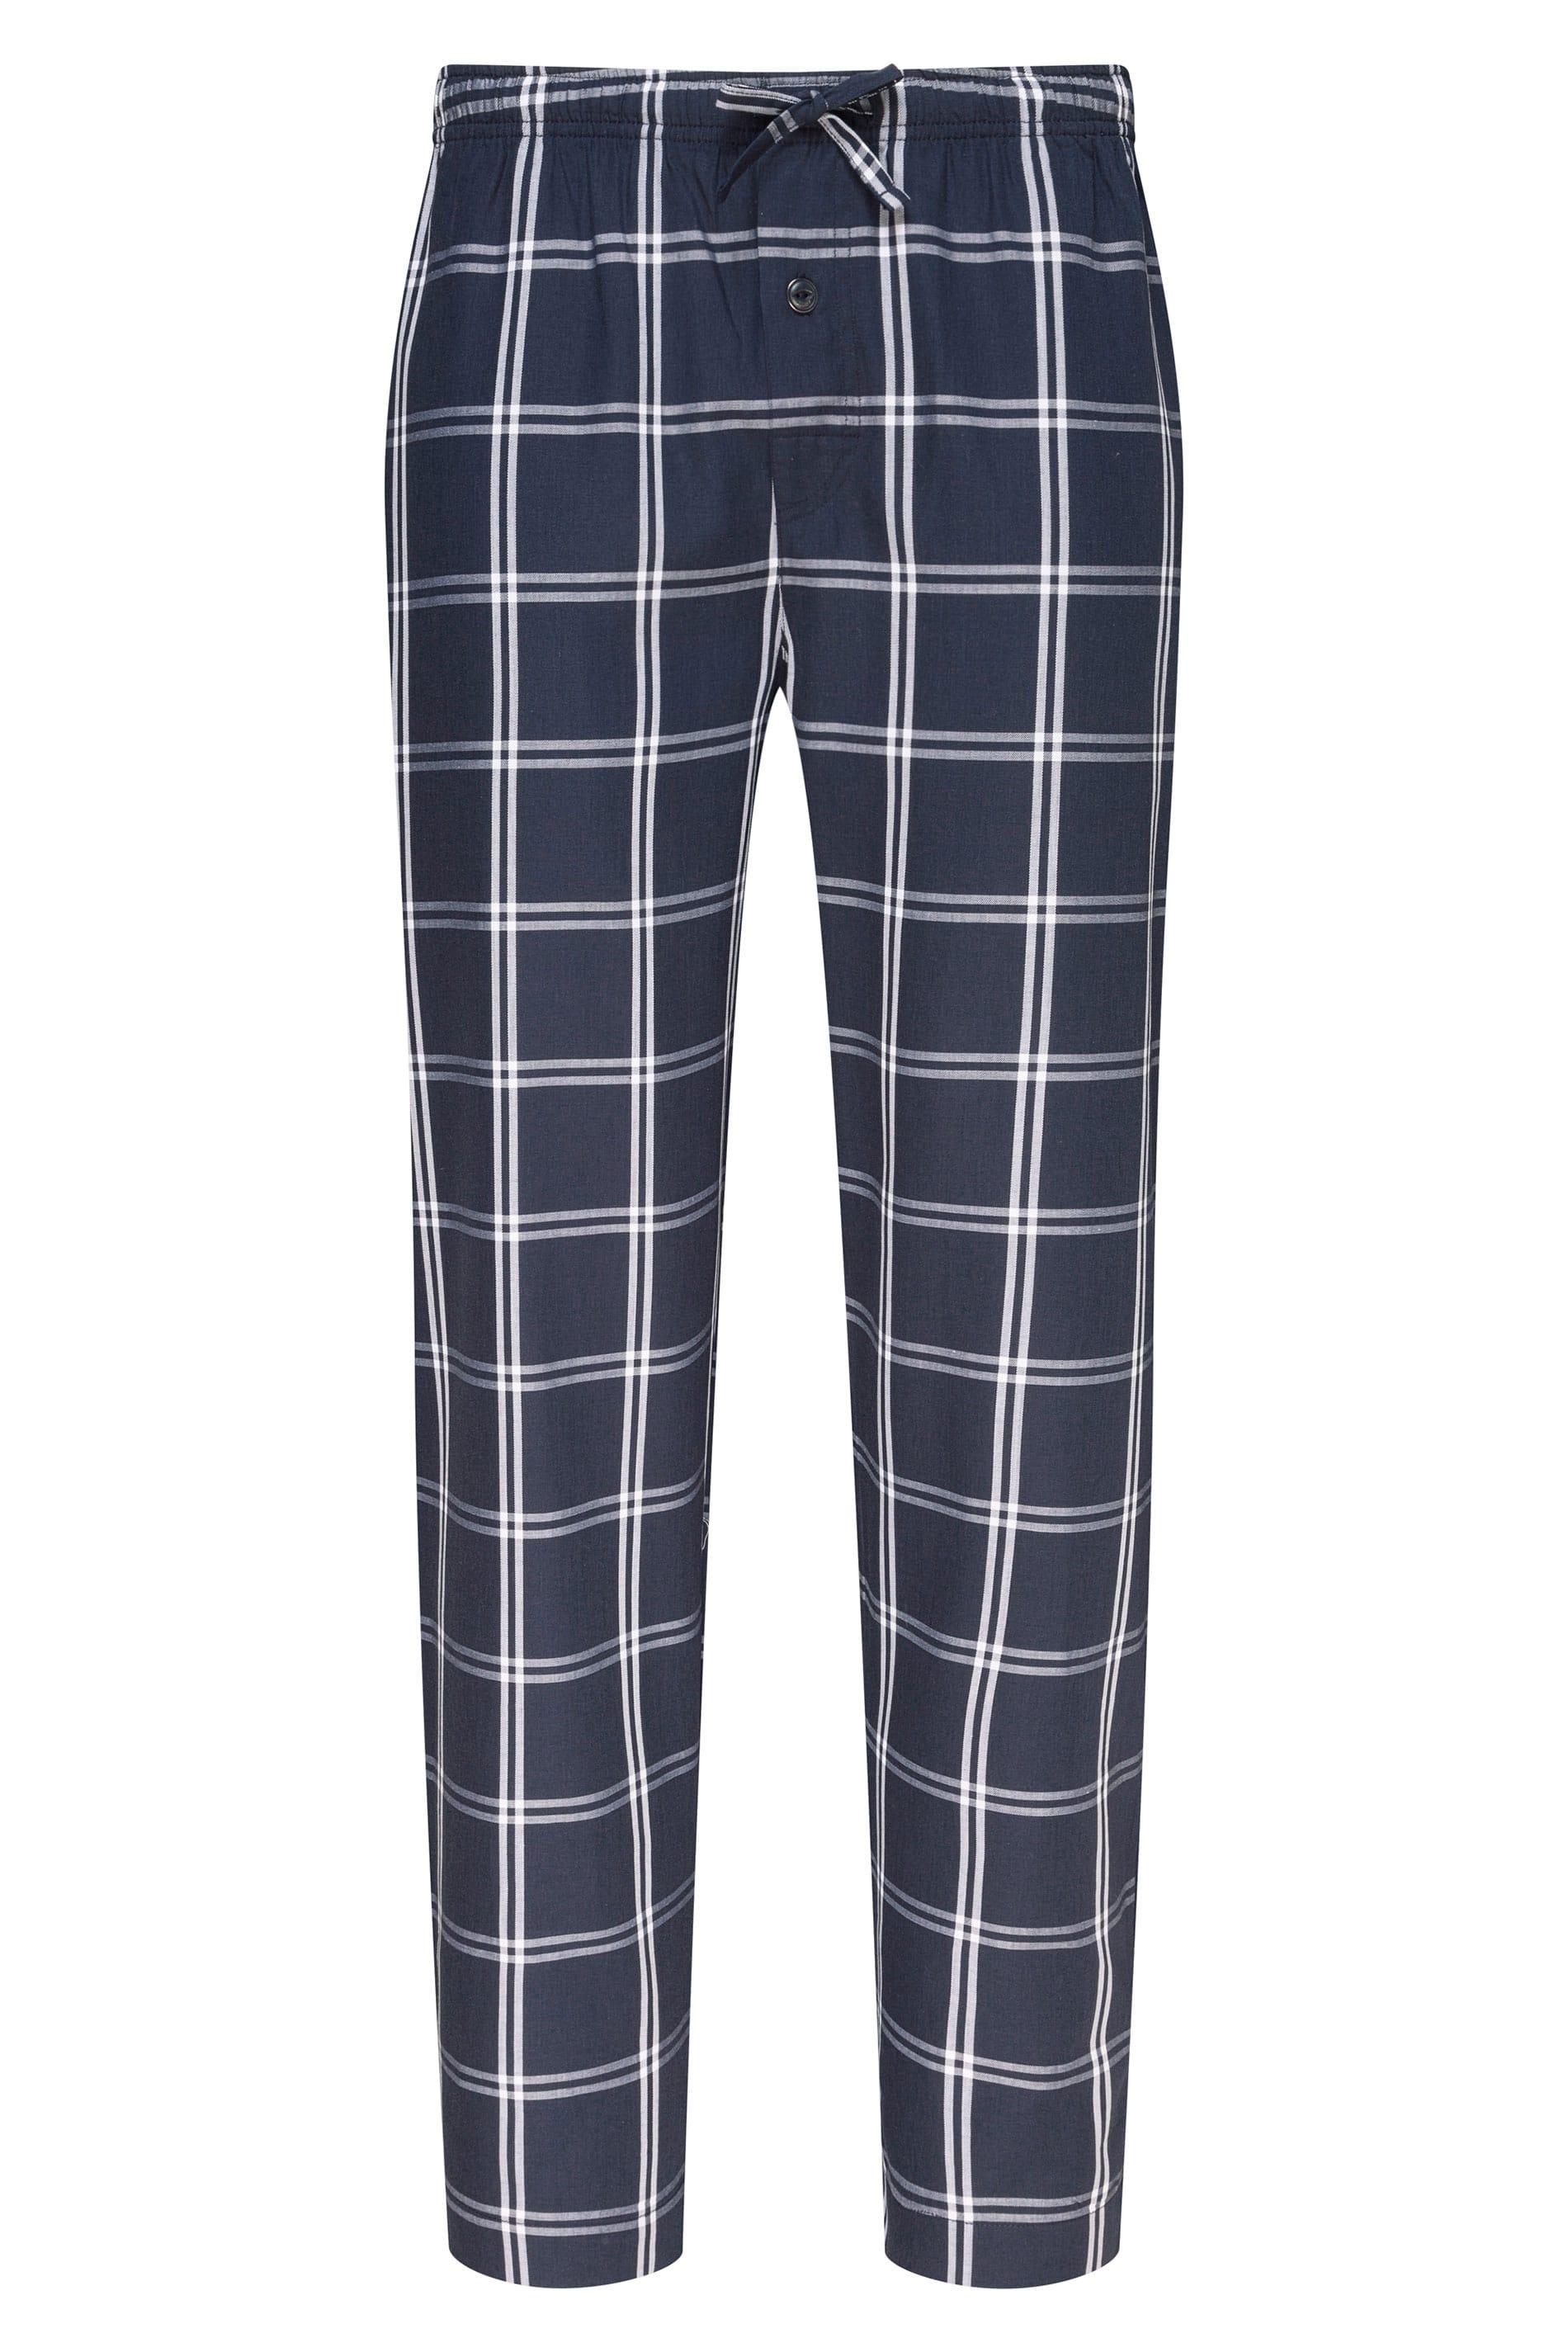 JOCKEY Navy Check Lounge Pyjama Bottoms